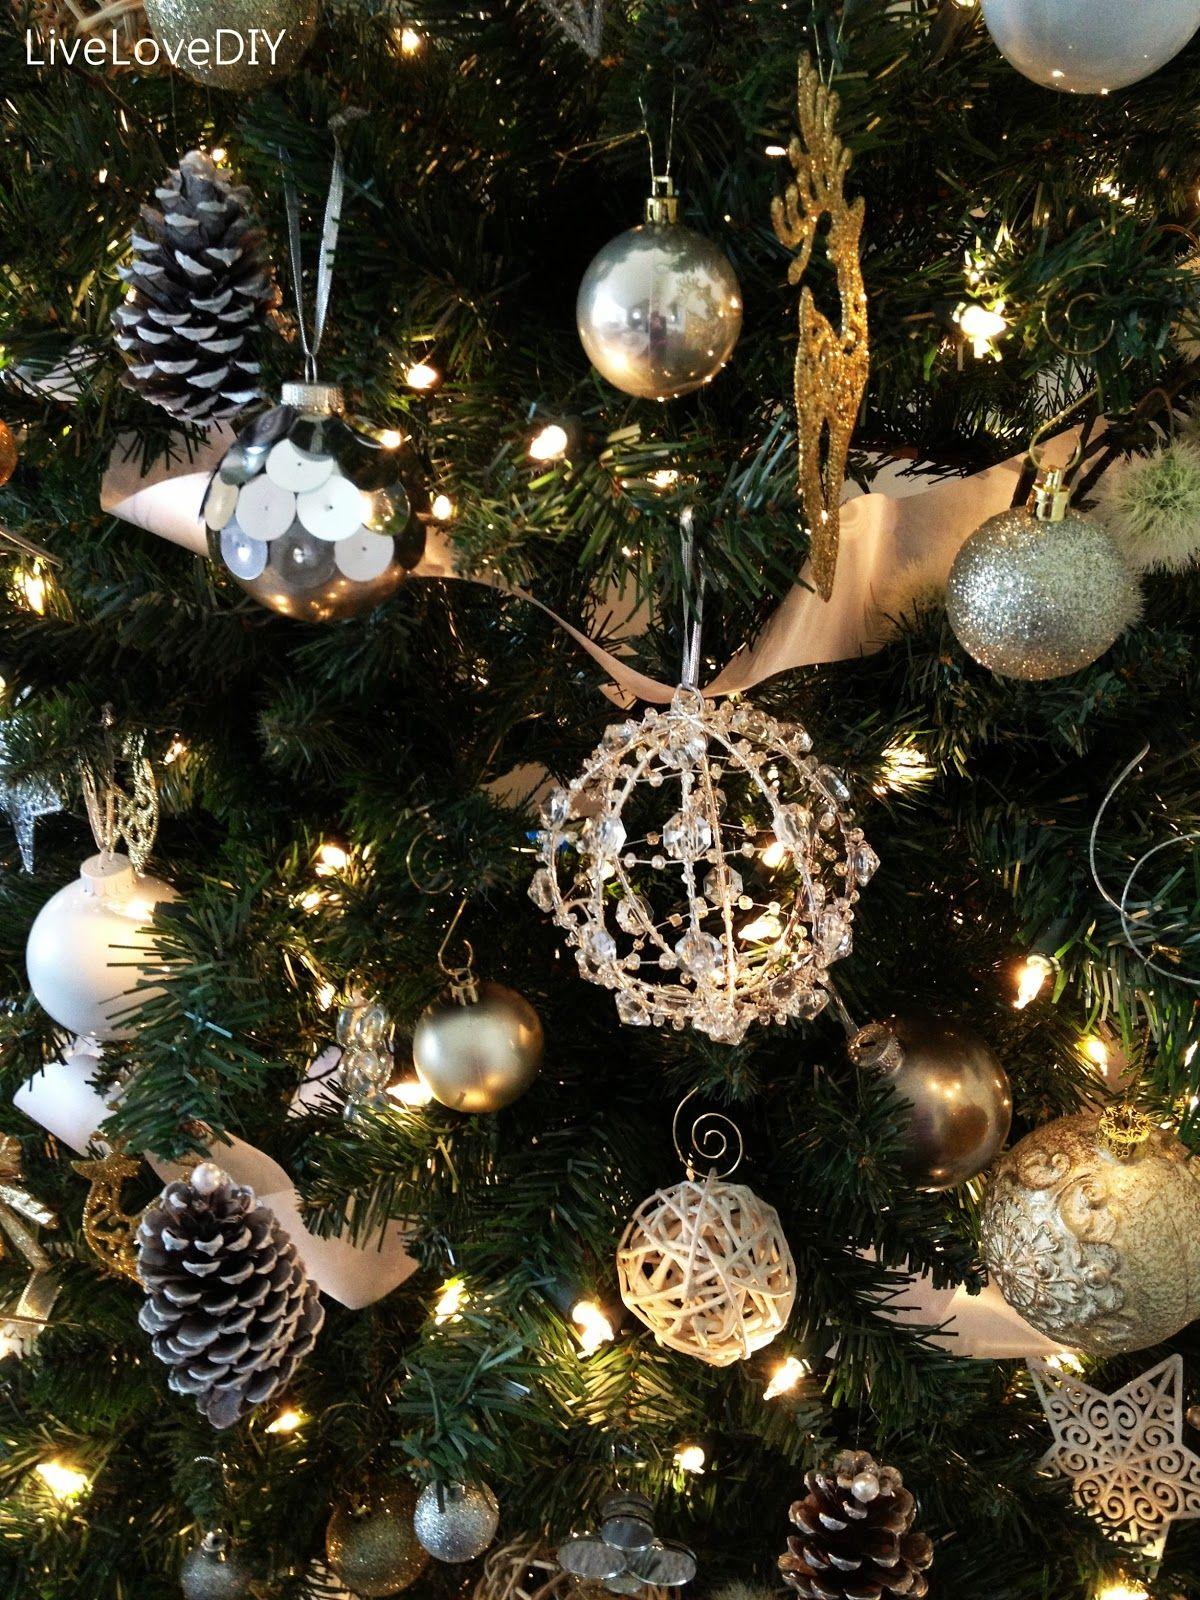 DIY Christmas Tree Decor with Pinecone and